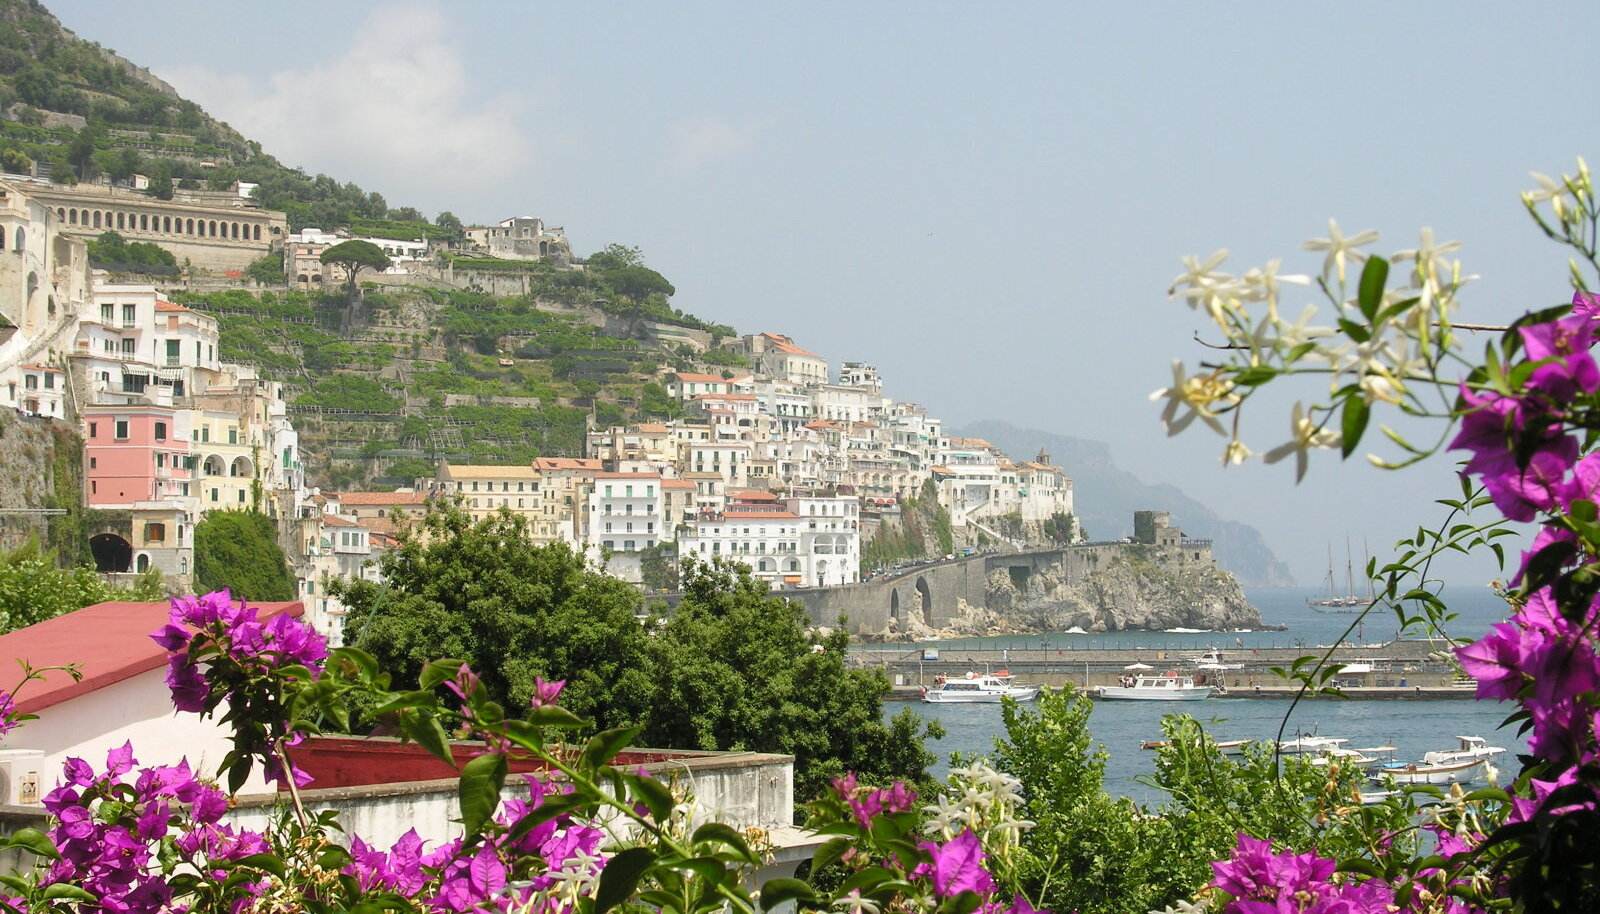 Amalfi rannik